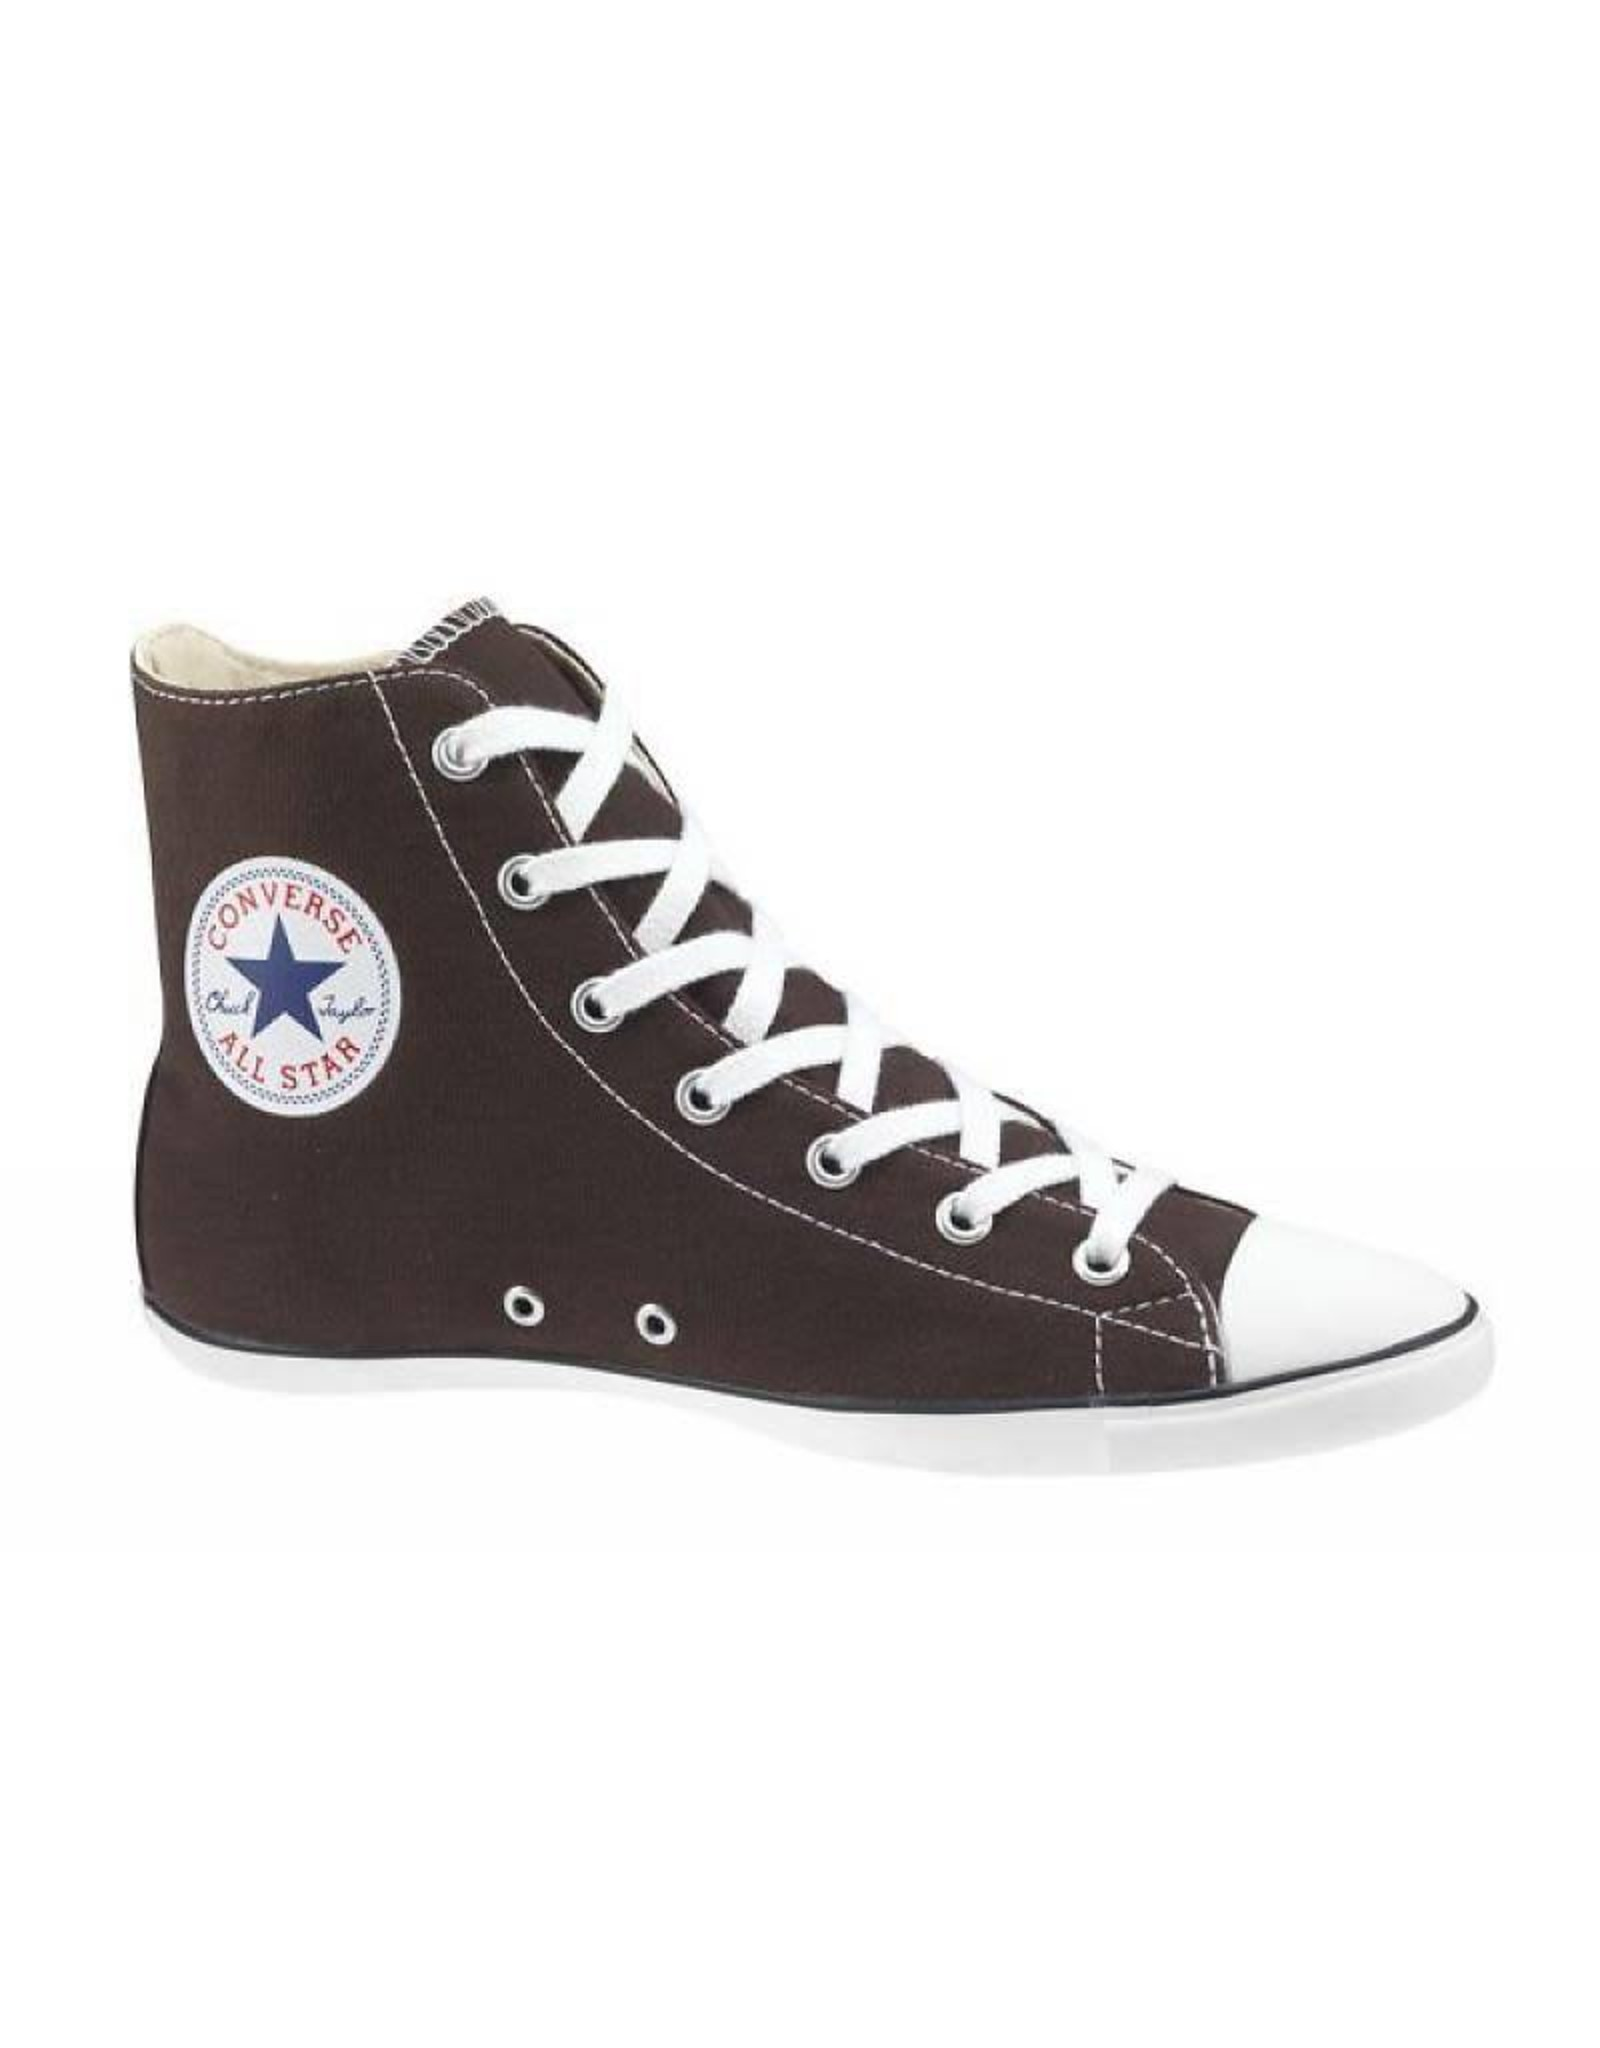 CONVERSE Chuck Taylor All Star LIGHT HI CHOCOLATE C9LCH-511523